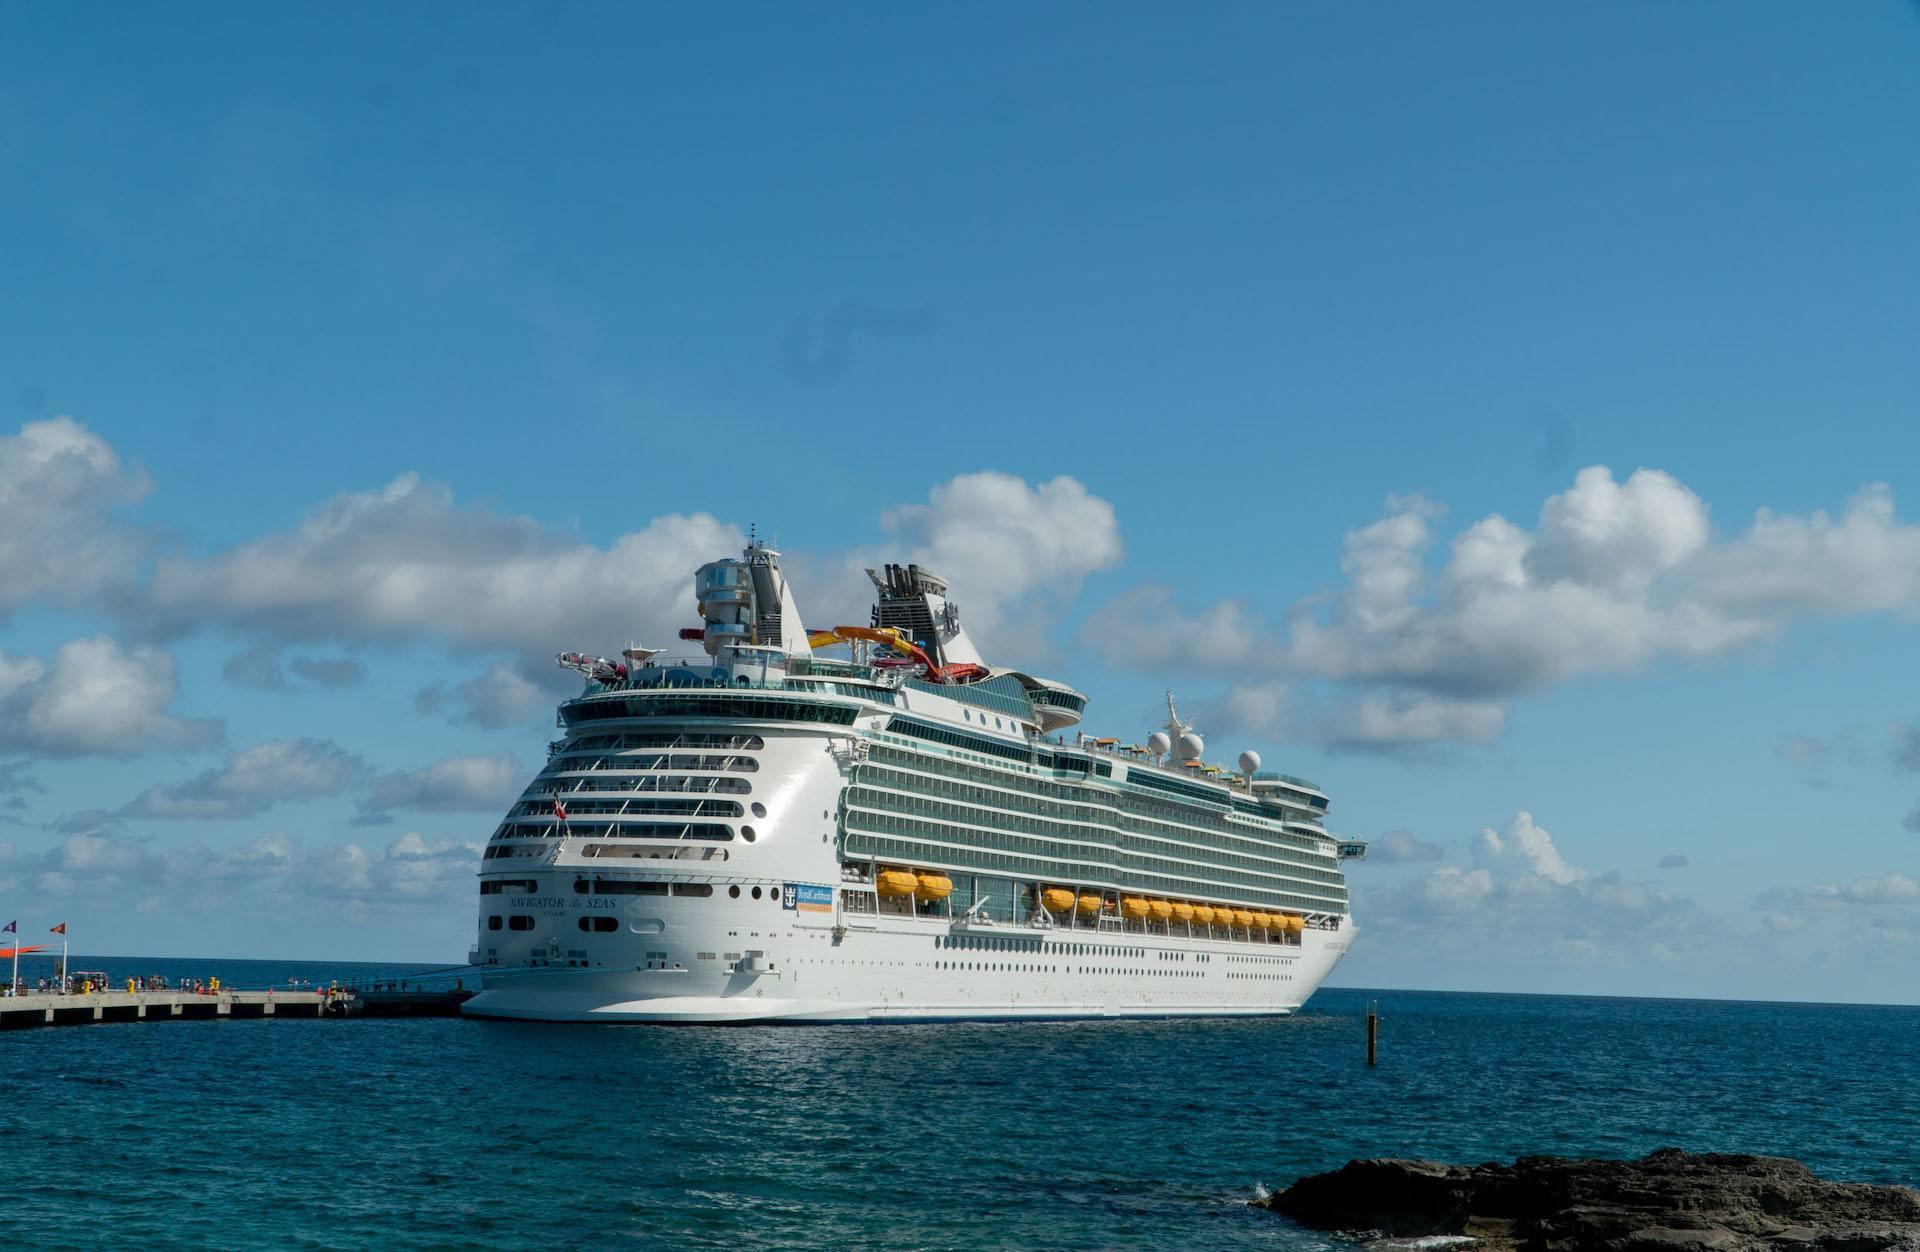 Royal Caribbean Navigator of the Seas at dock